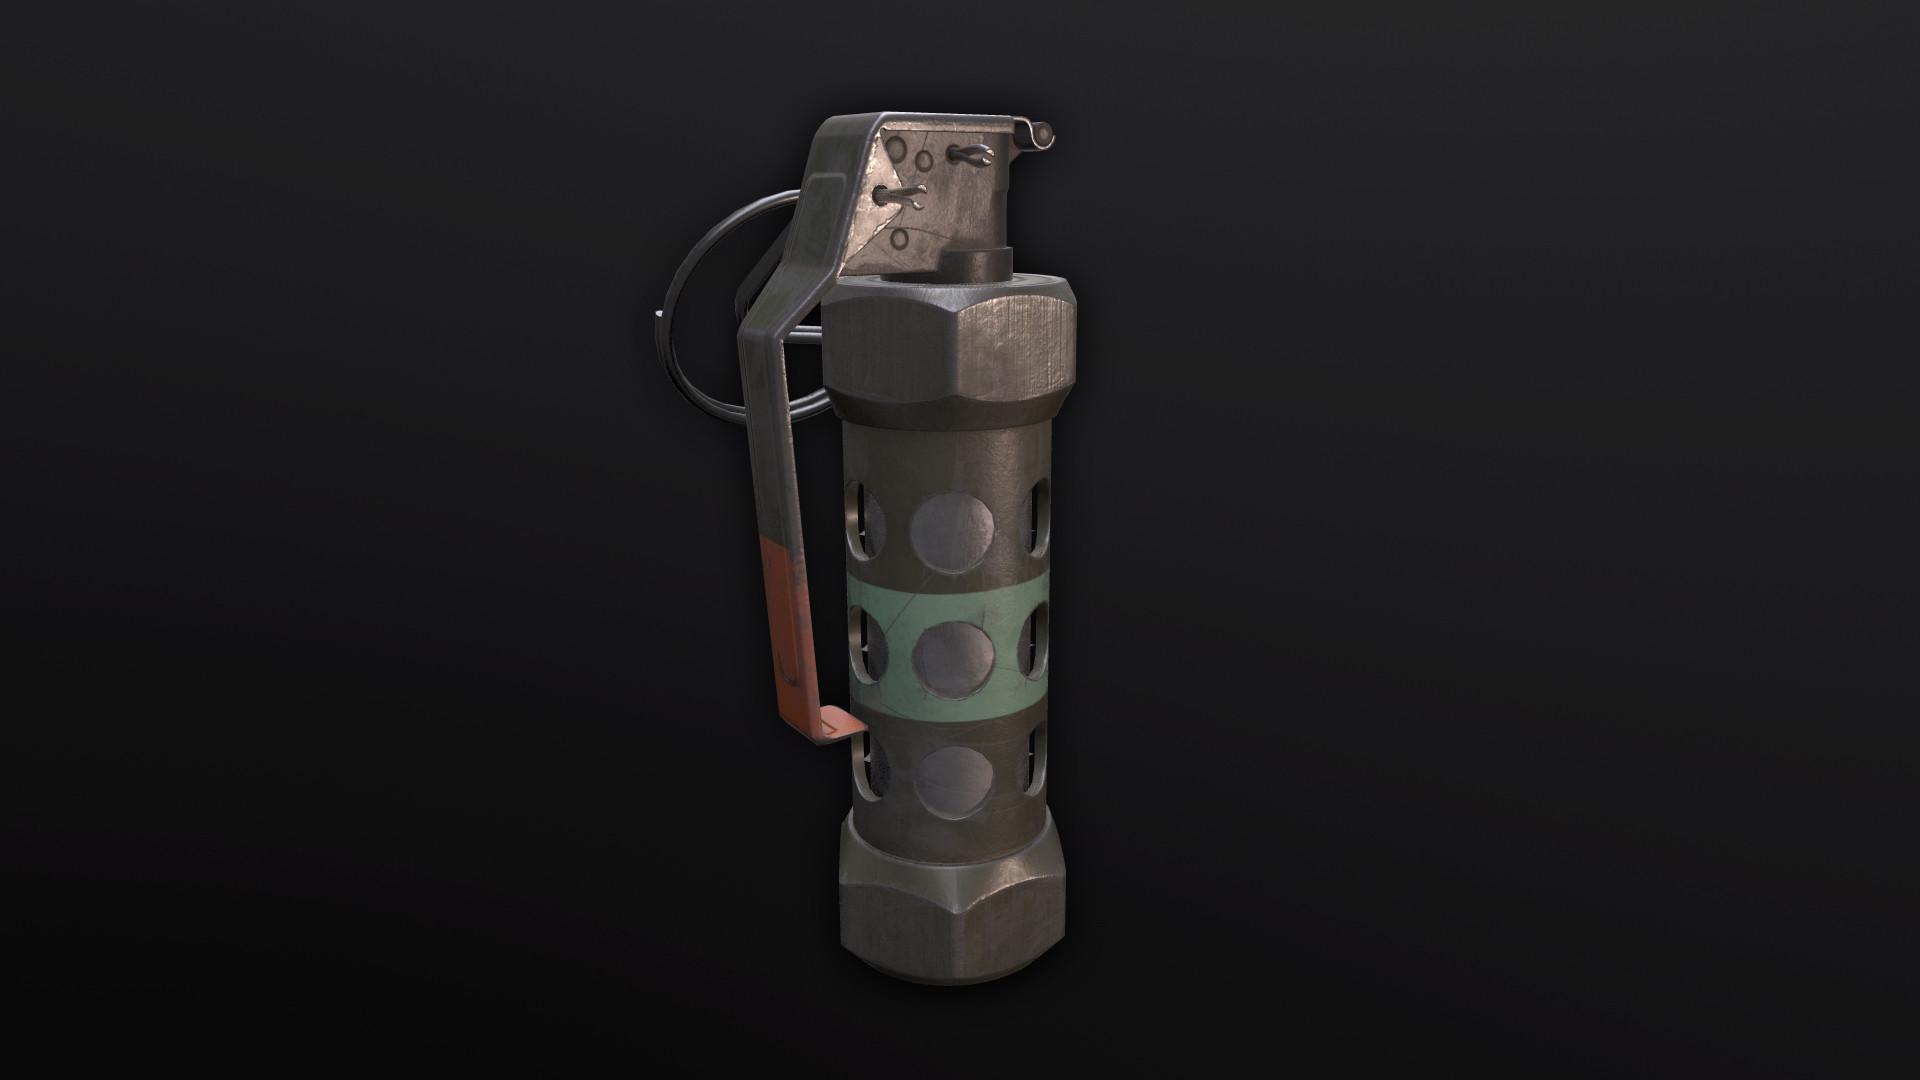 M18 Smoke Grenade, M84 Stun Grenade & M67 Frag Grenade